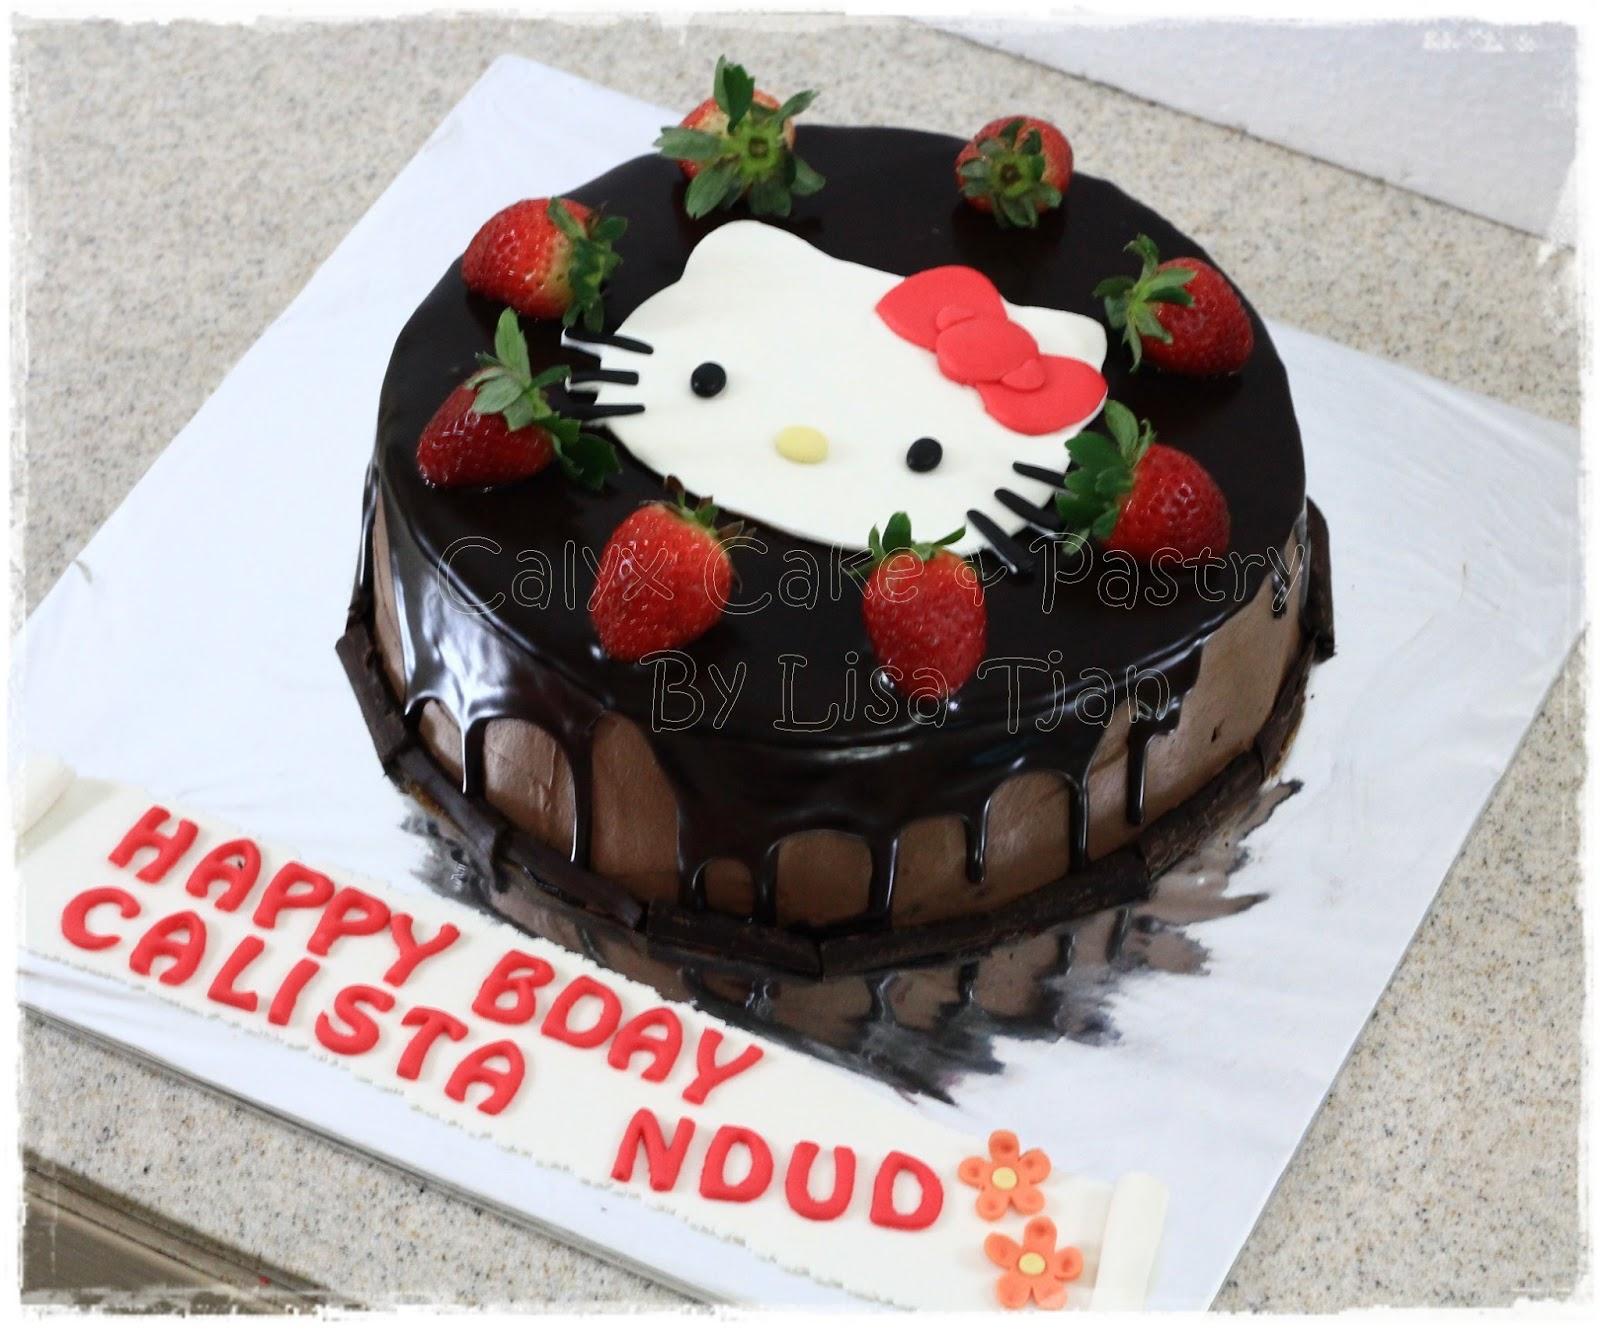 Calyx Cake Pastry Hello Kitty Chocolate Cake Calista